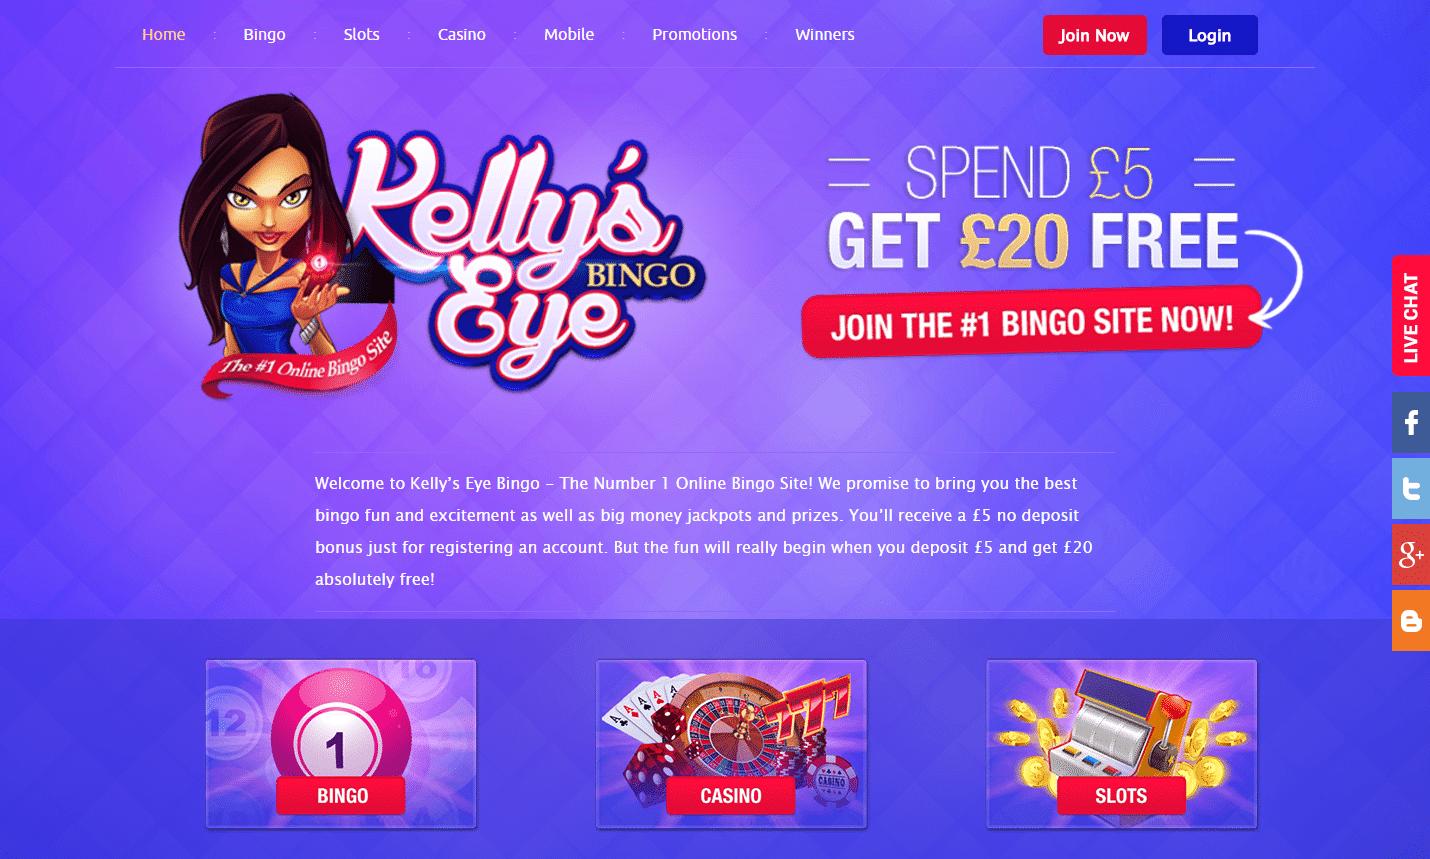 kellys-eye